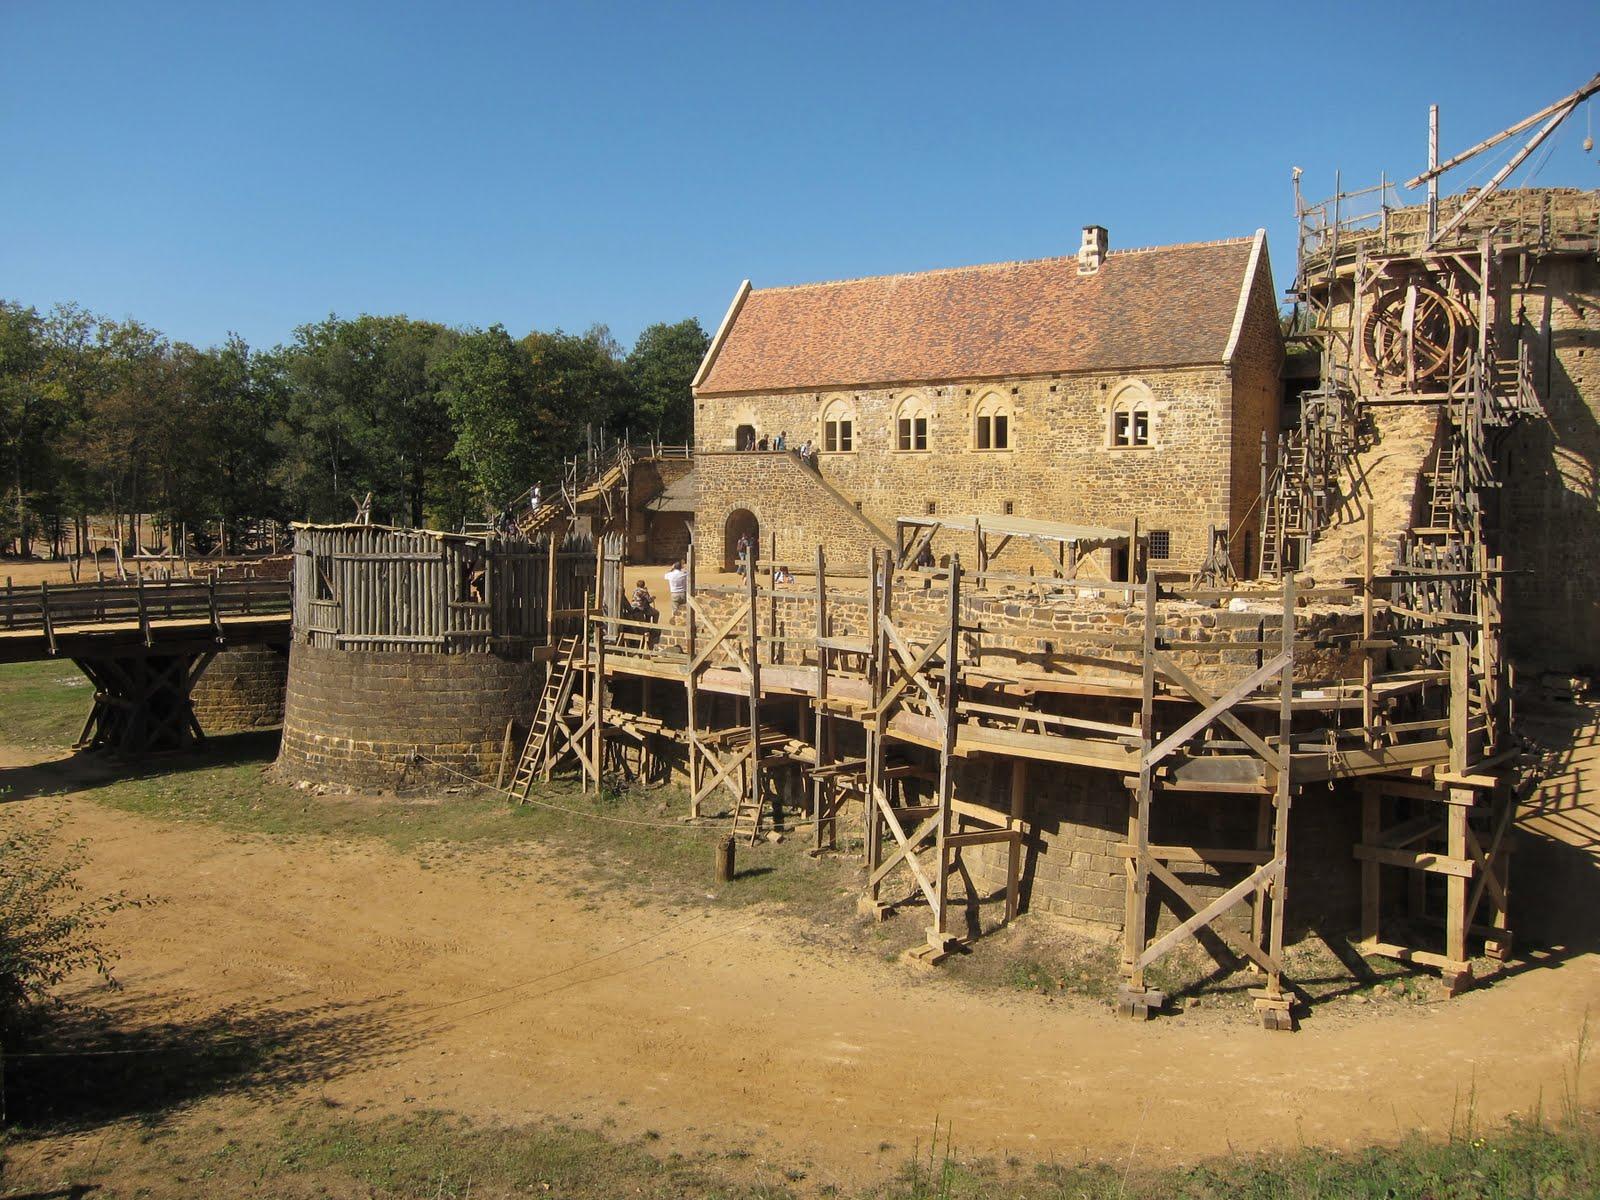 file 39 13th century 39 castle gu delon 9 years into construction in 2011. Black Bedroom Furniture Sets. Home Design Ideas